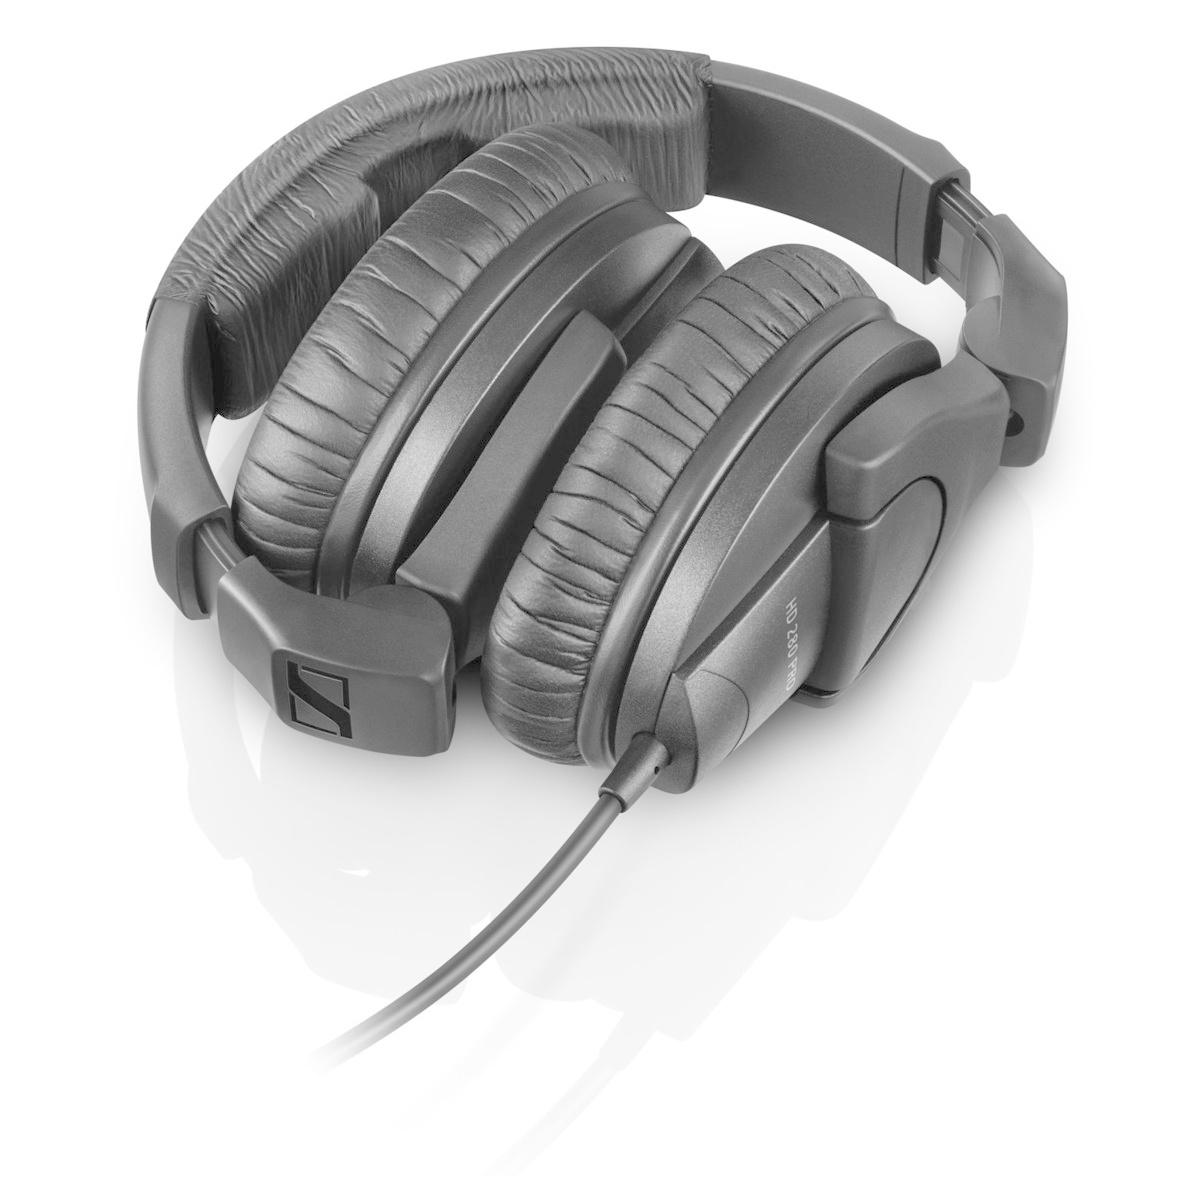 Sennheiser Sennheiser HD280 PRO Headphones